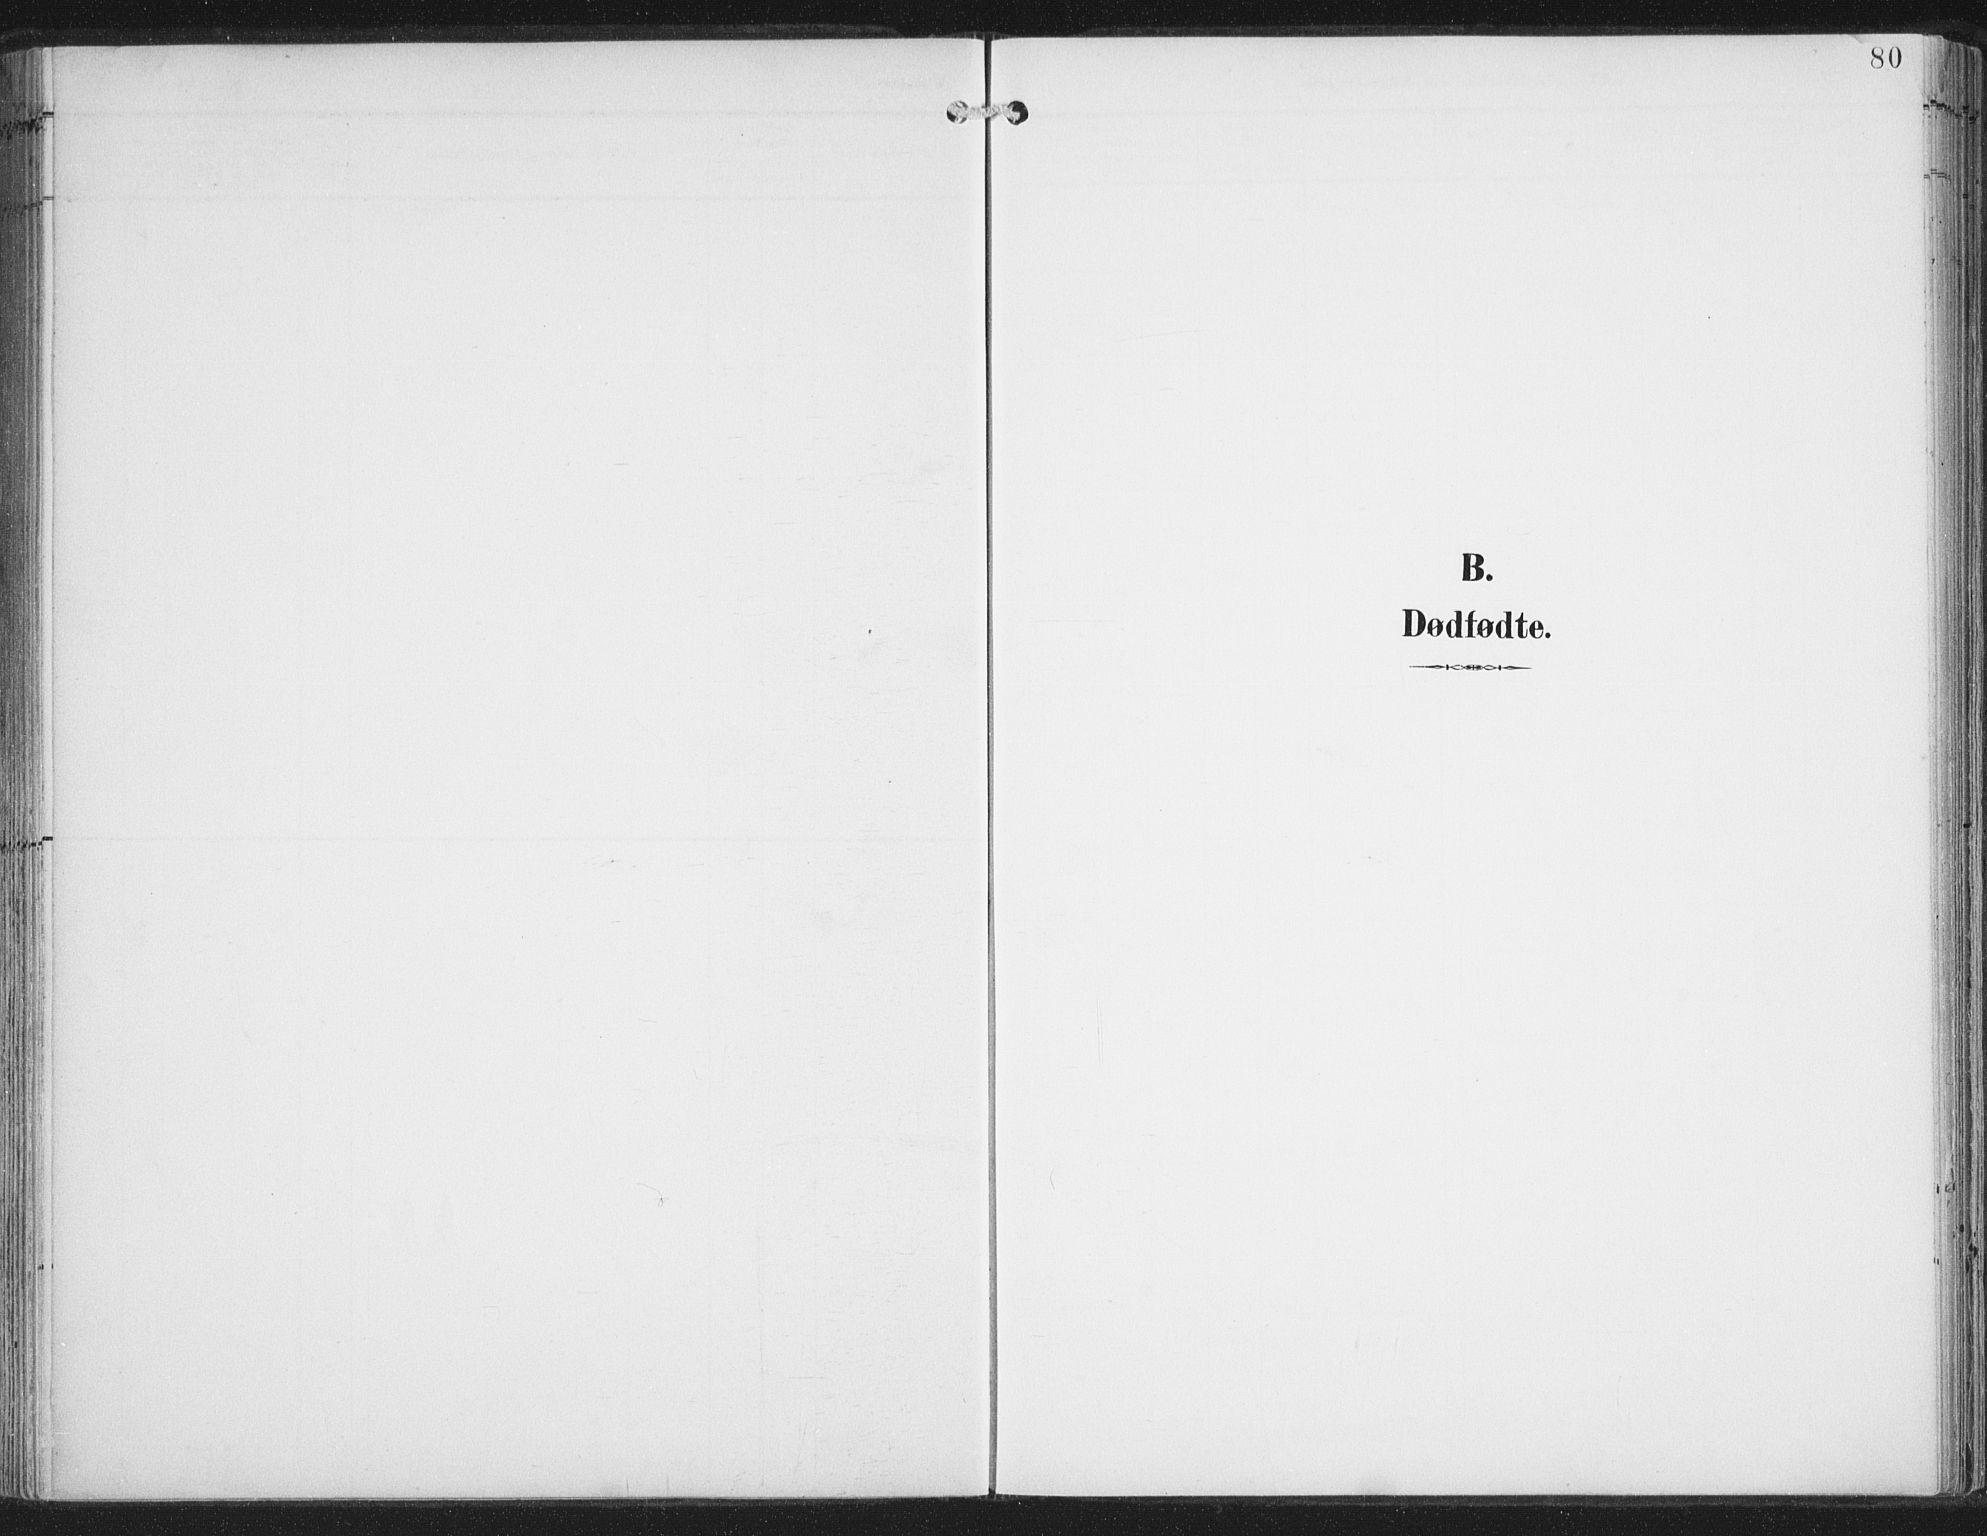 SATØ, Lenvik sokneprestembete, H/Ha: Ministerialbok nr. 15, 1896-1915, s. 80